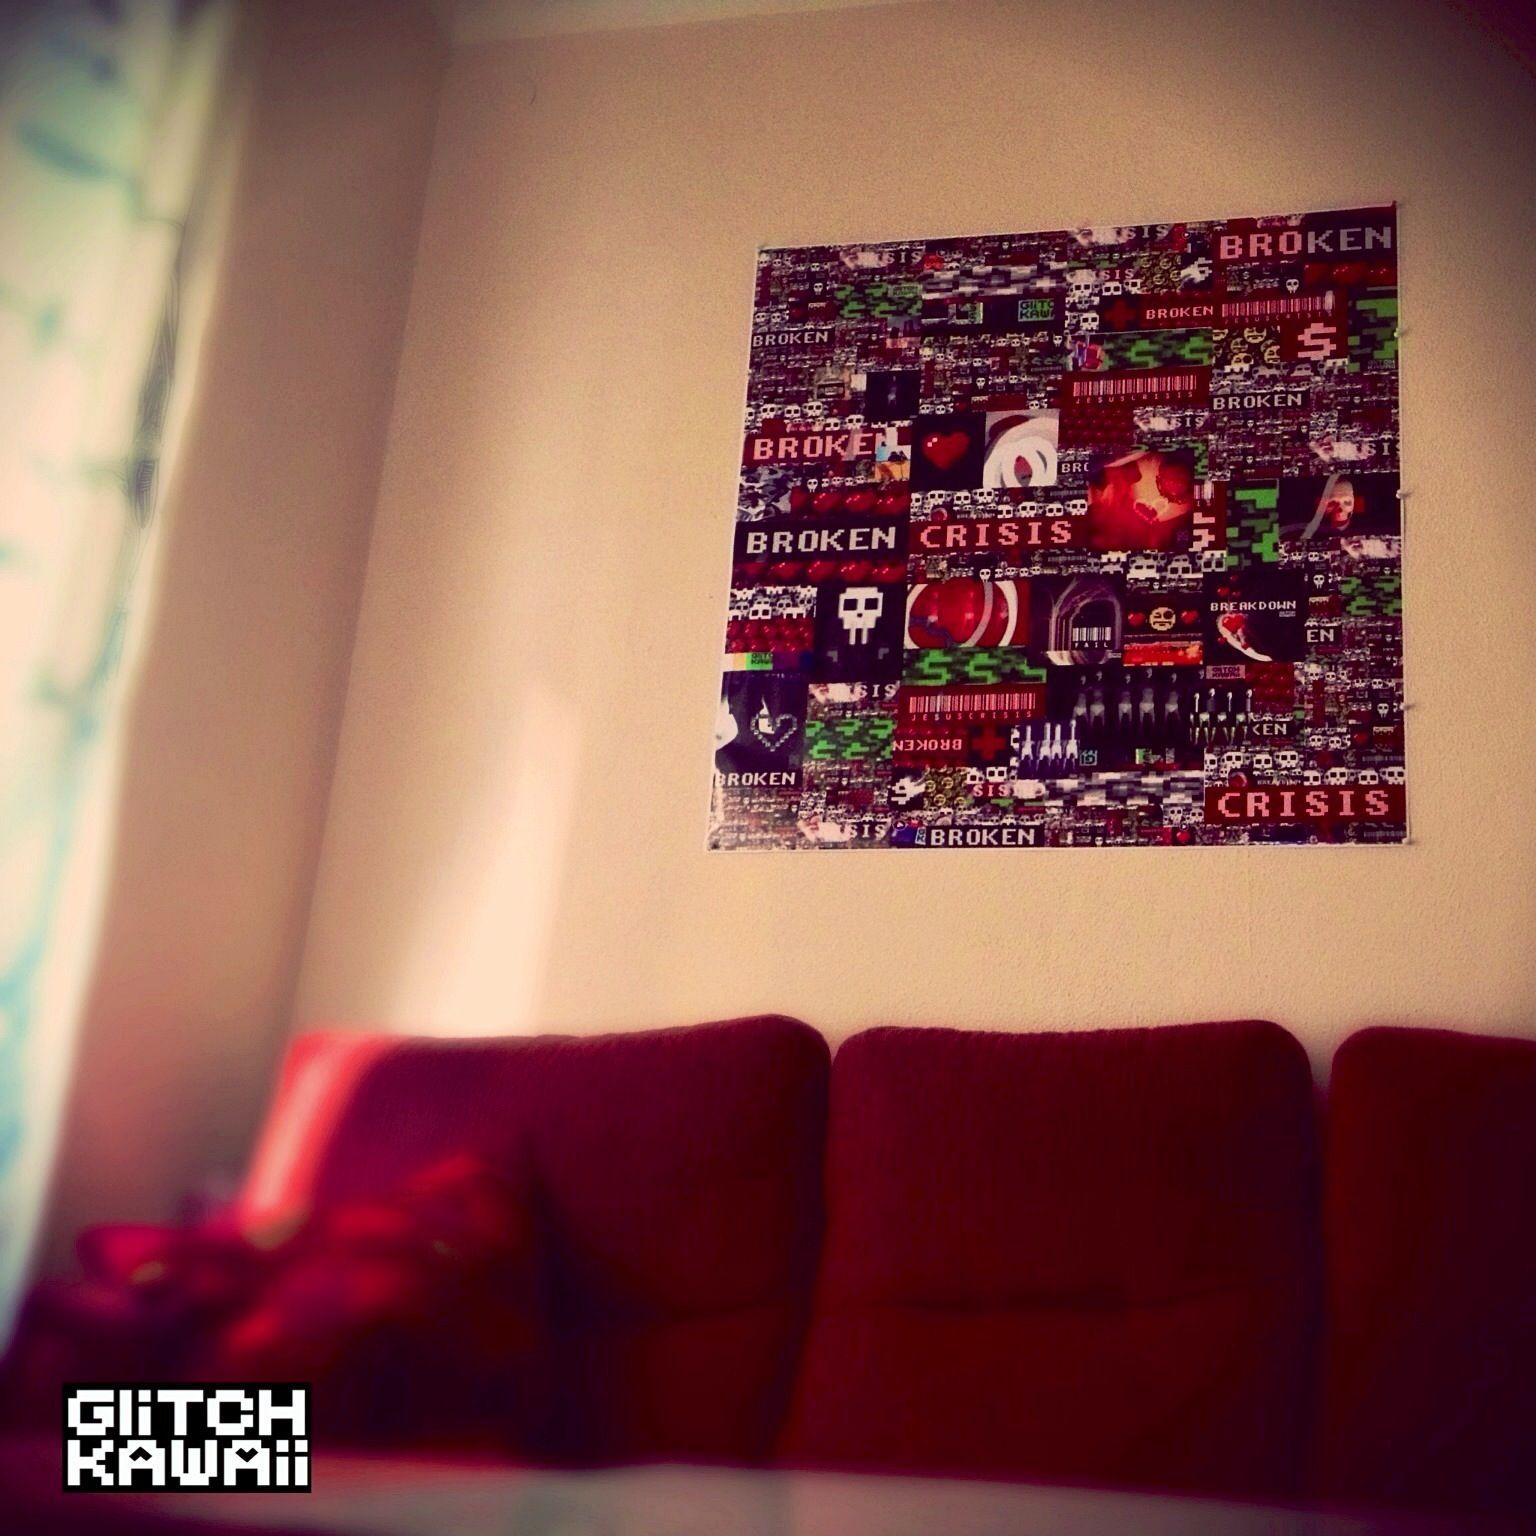 Glitches in my House by GlitchKawaii